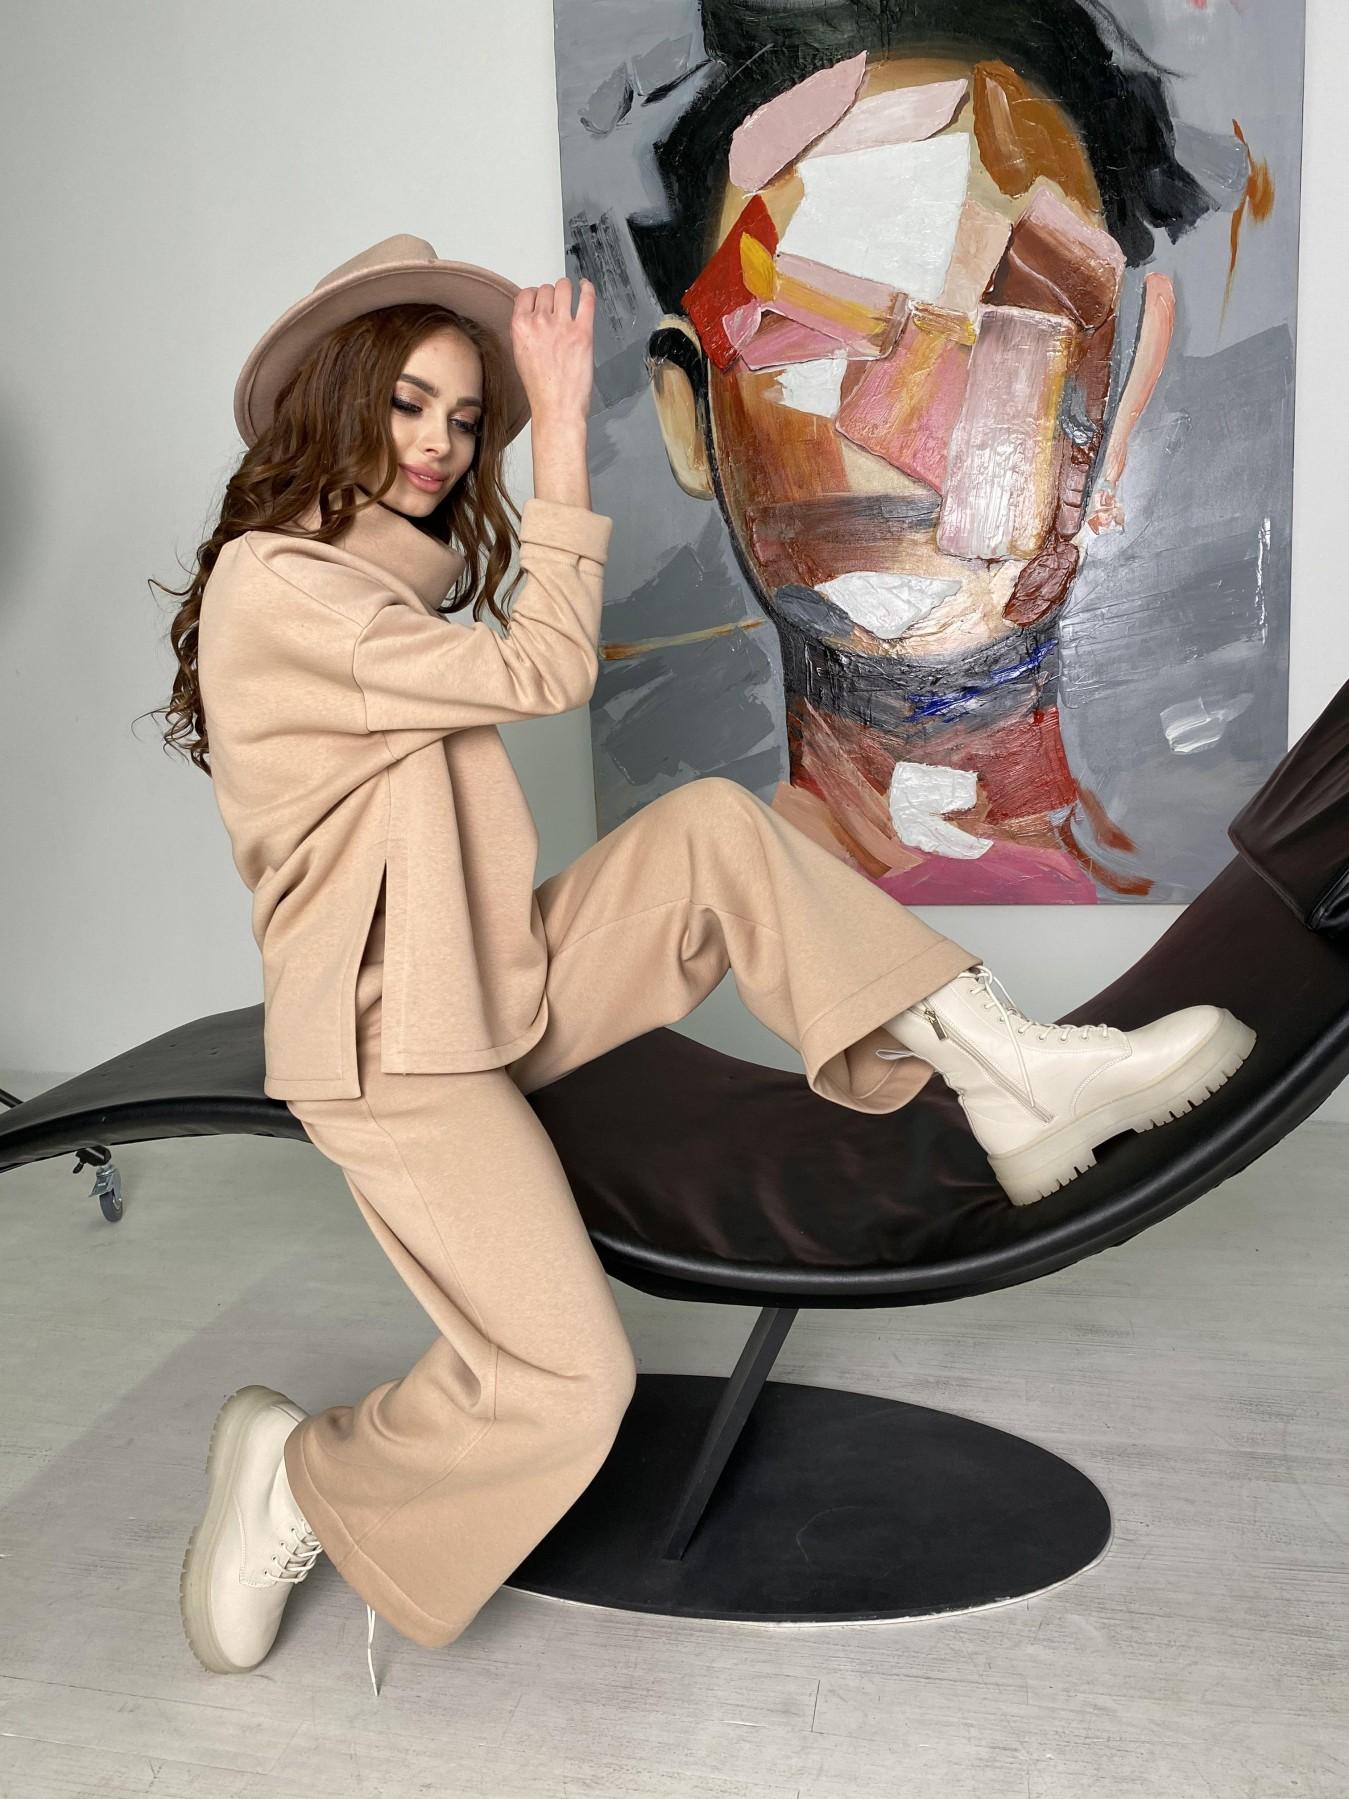 Джаст костюм на флисе 3х нитка 10513 АРТ. 46846 Цвет: Бежевый - фото 4, интернет магазин tm-modus.ru